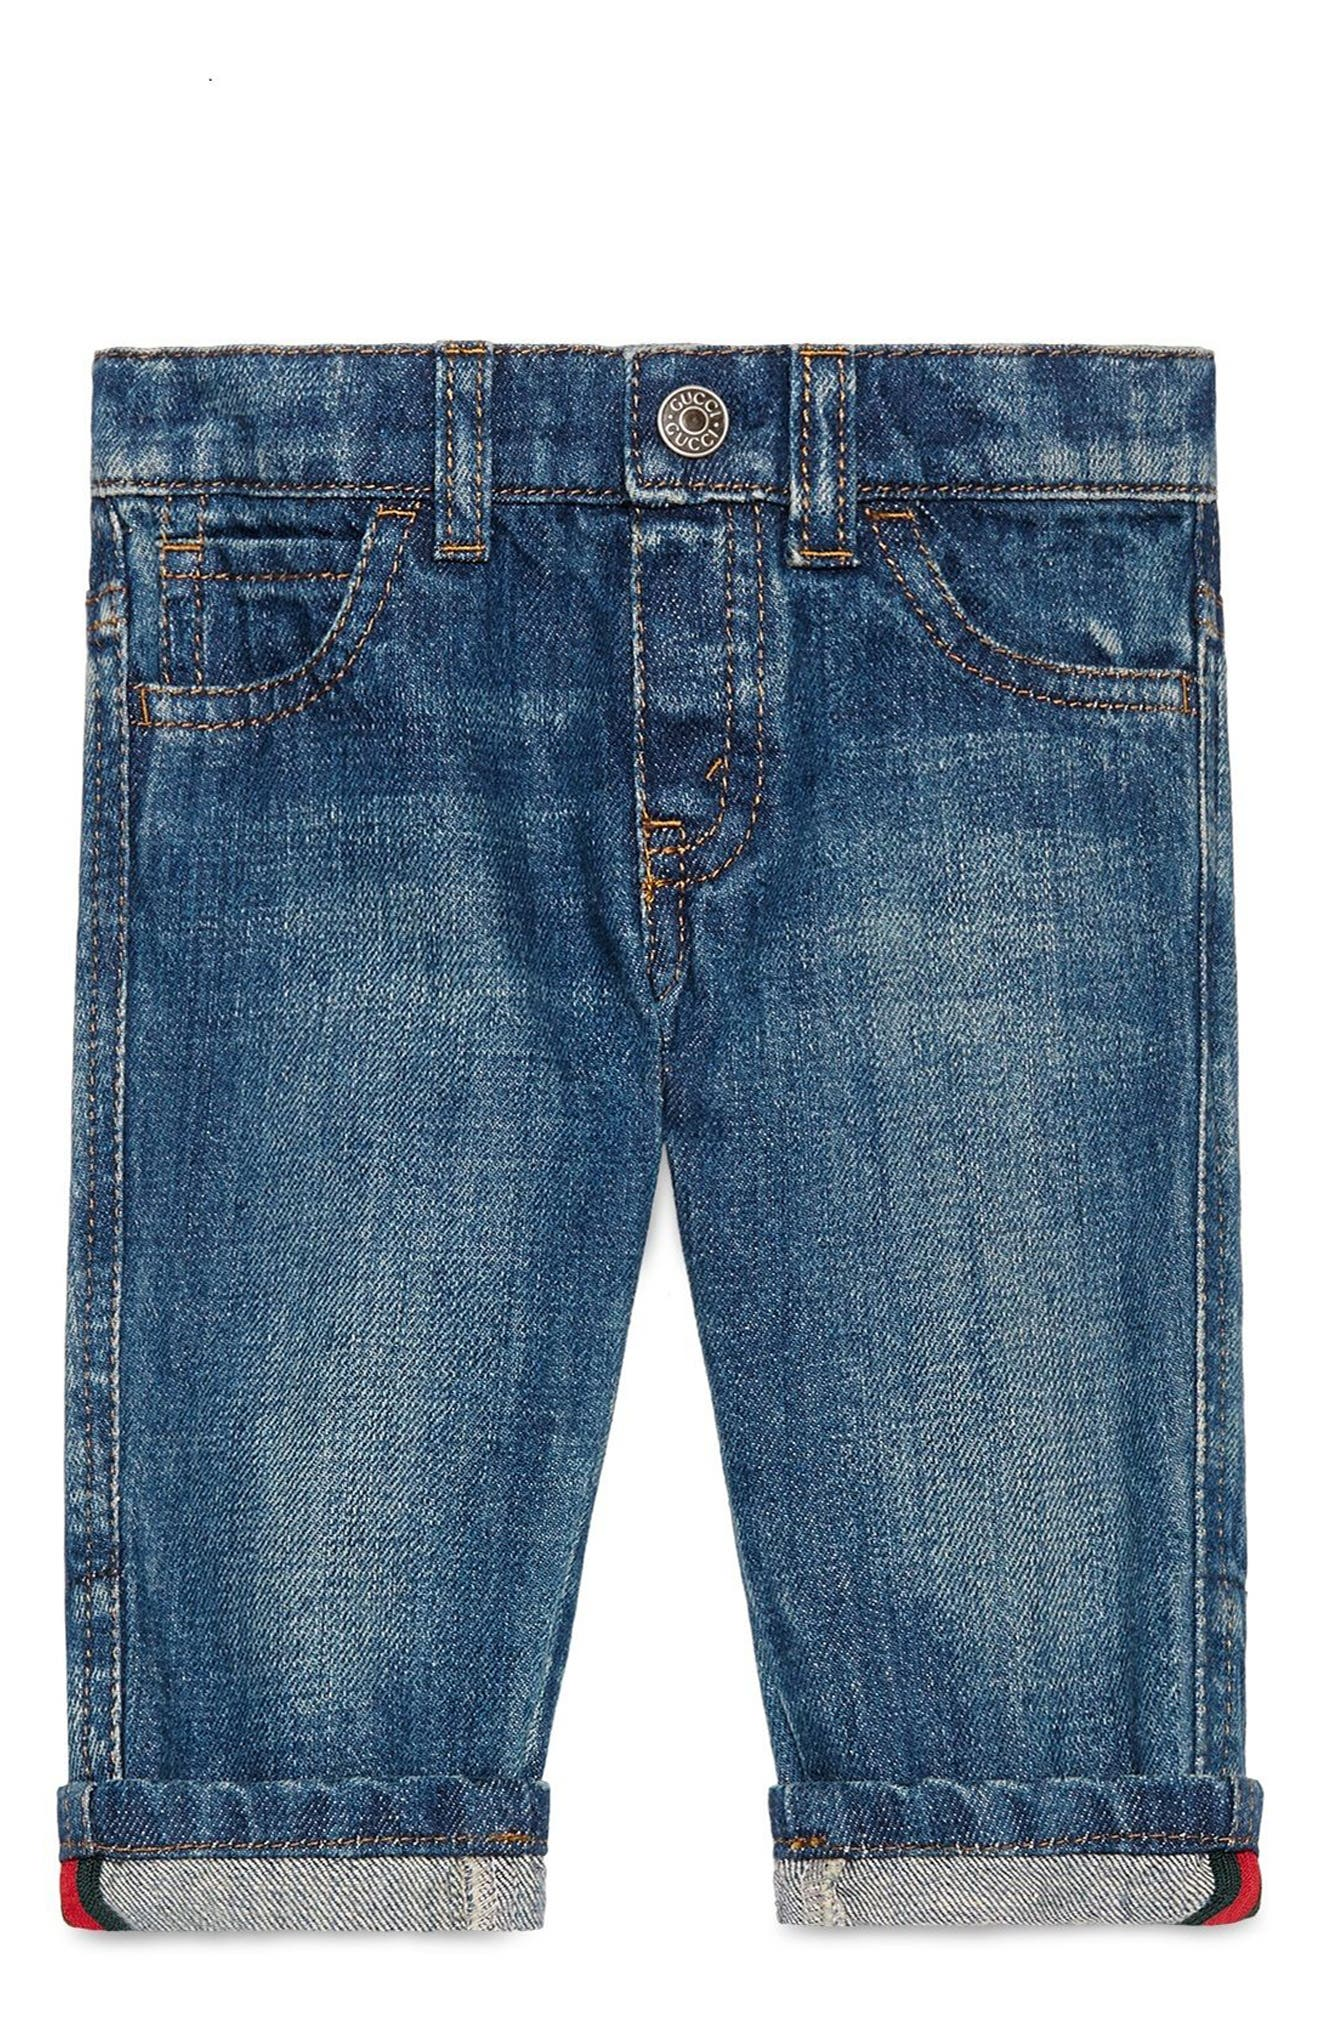 Straight Leg Jeans,                             Main thumbnail 1, color,                             Orbit Multi